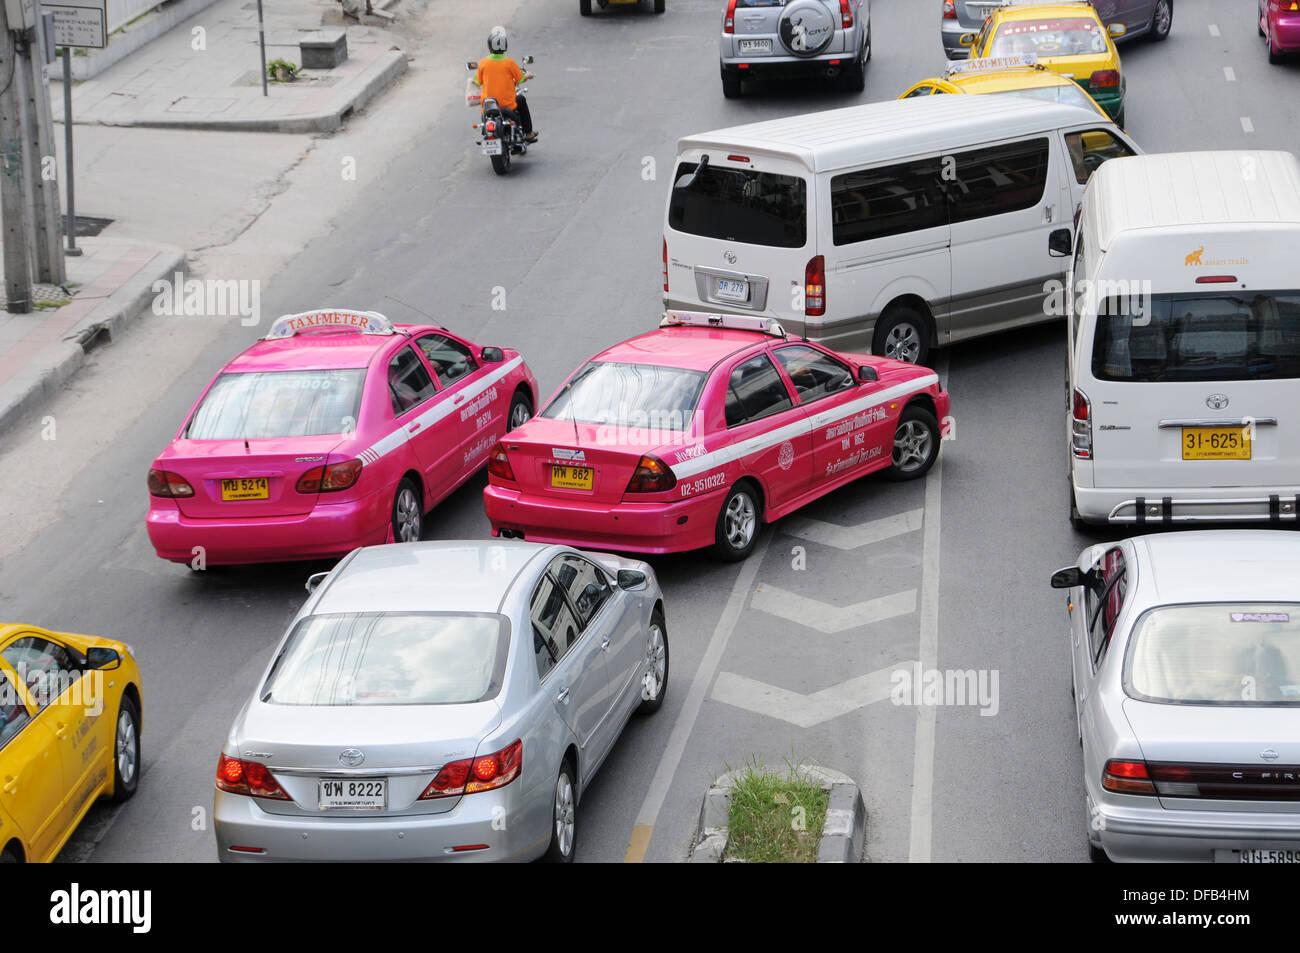 Cars when changing lanes in Bangkok Stock Photo: 61096048 - Alamy